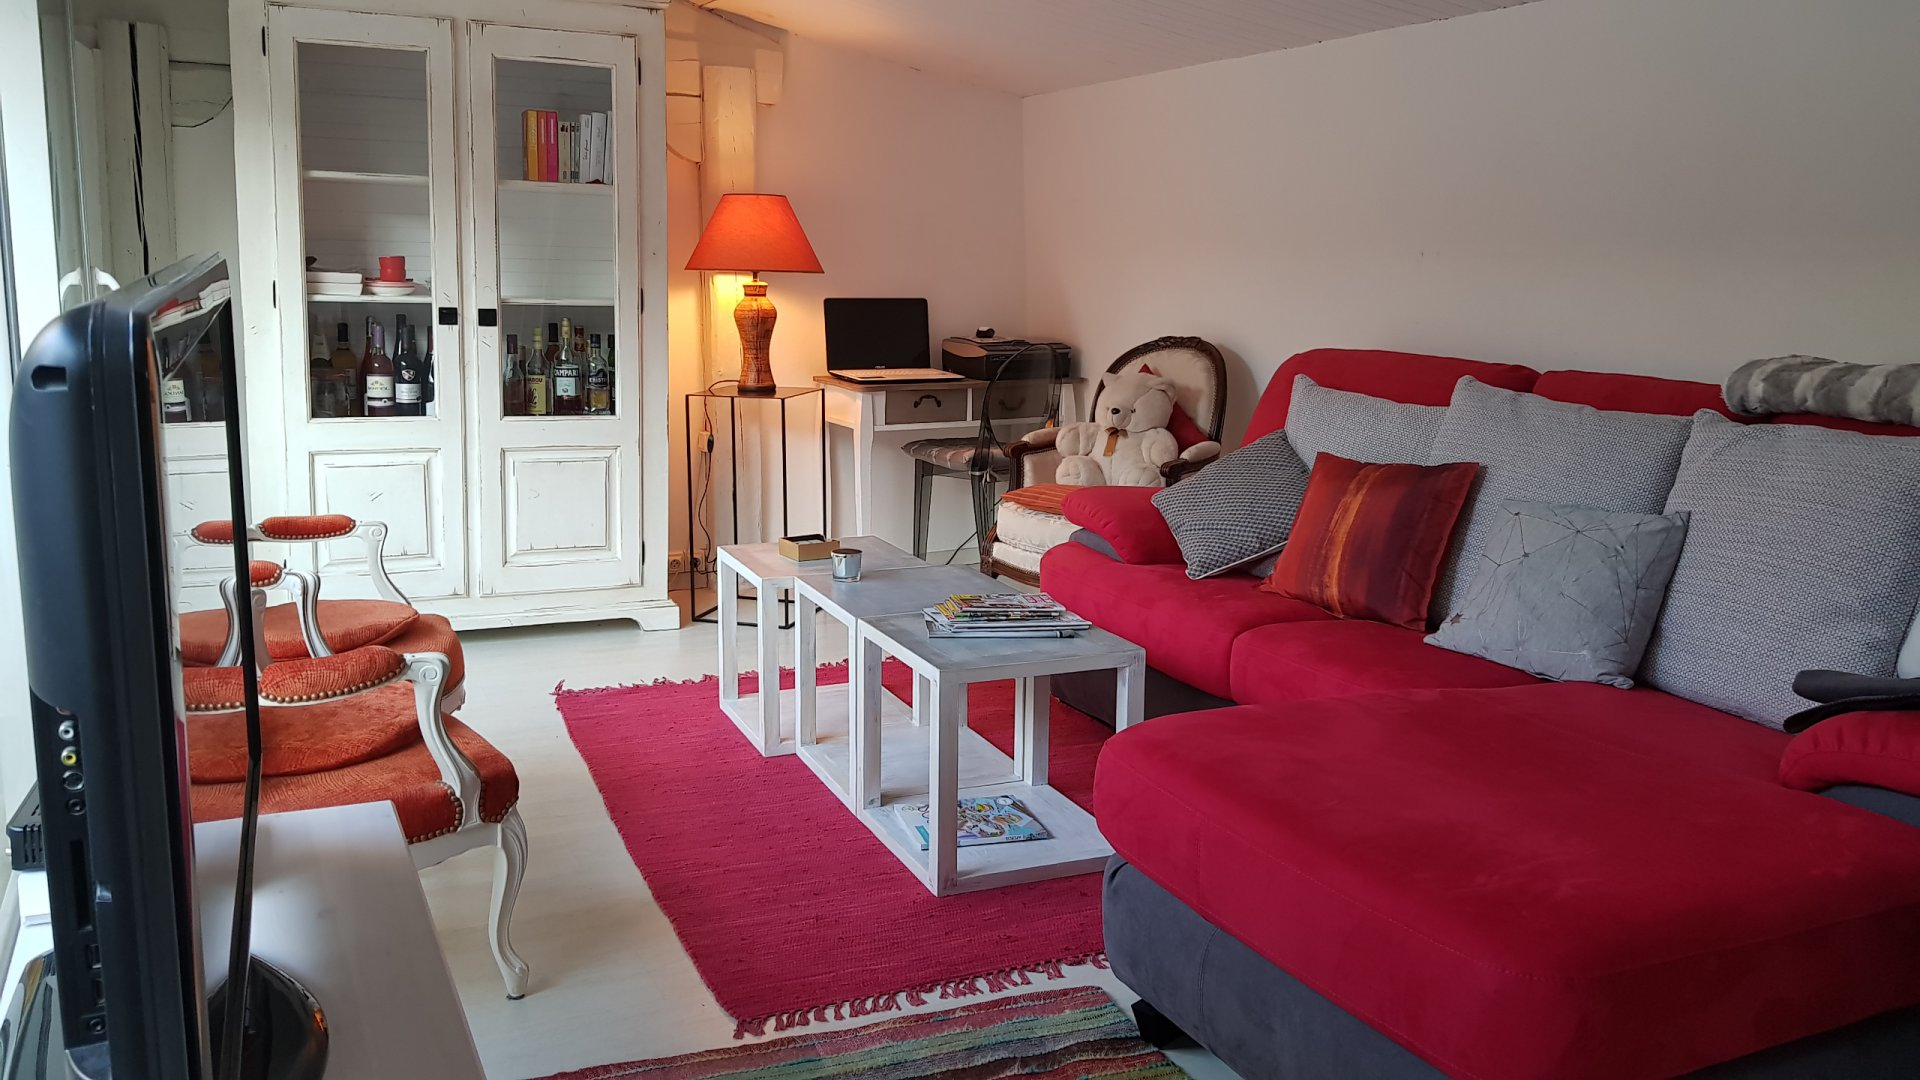 Vendita Casa - Mandelieu-la-Napoule